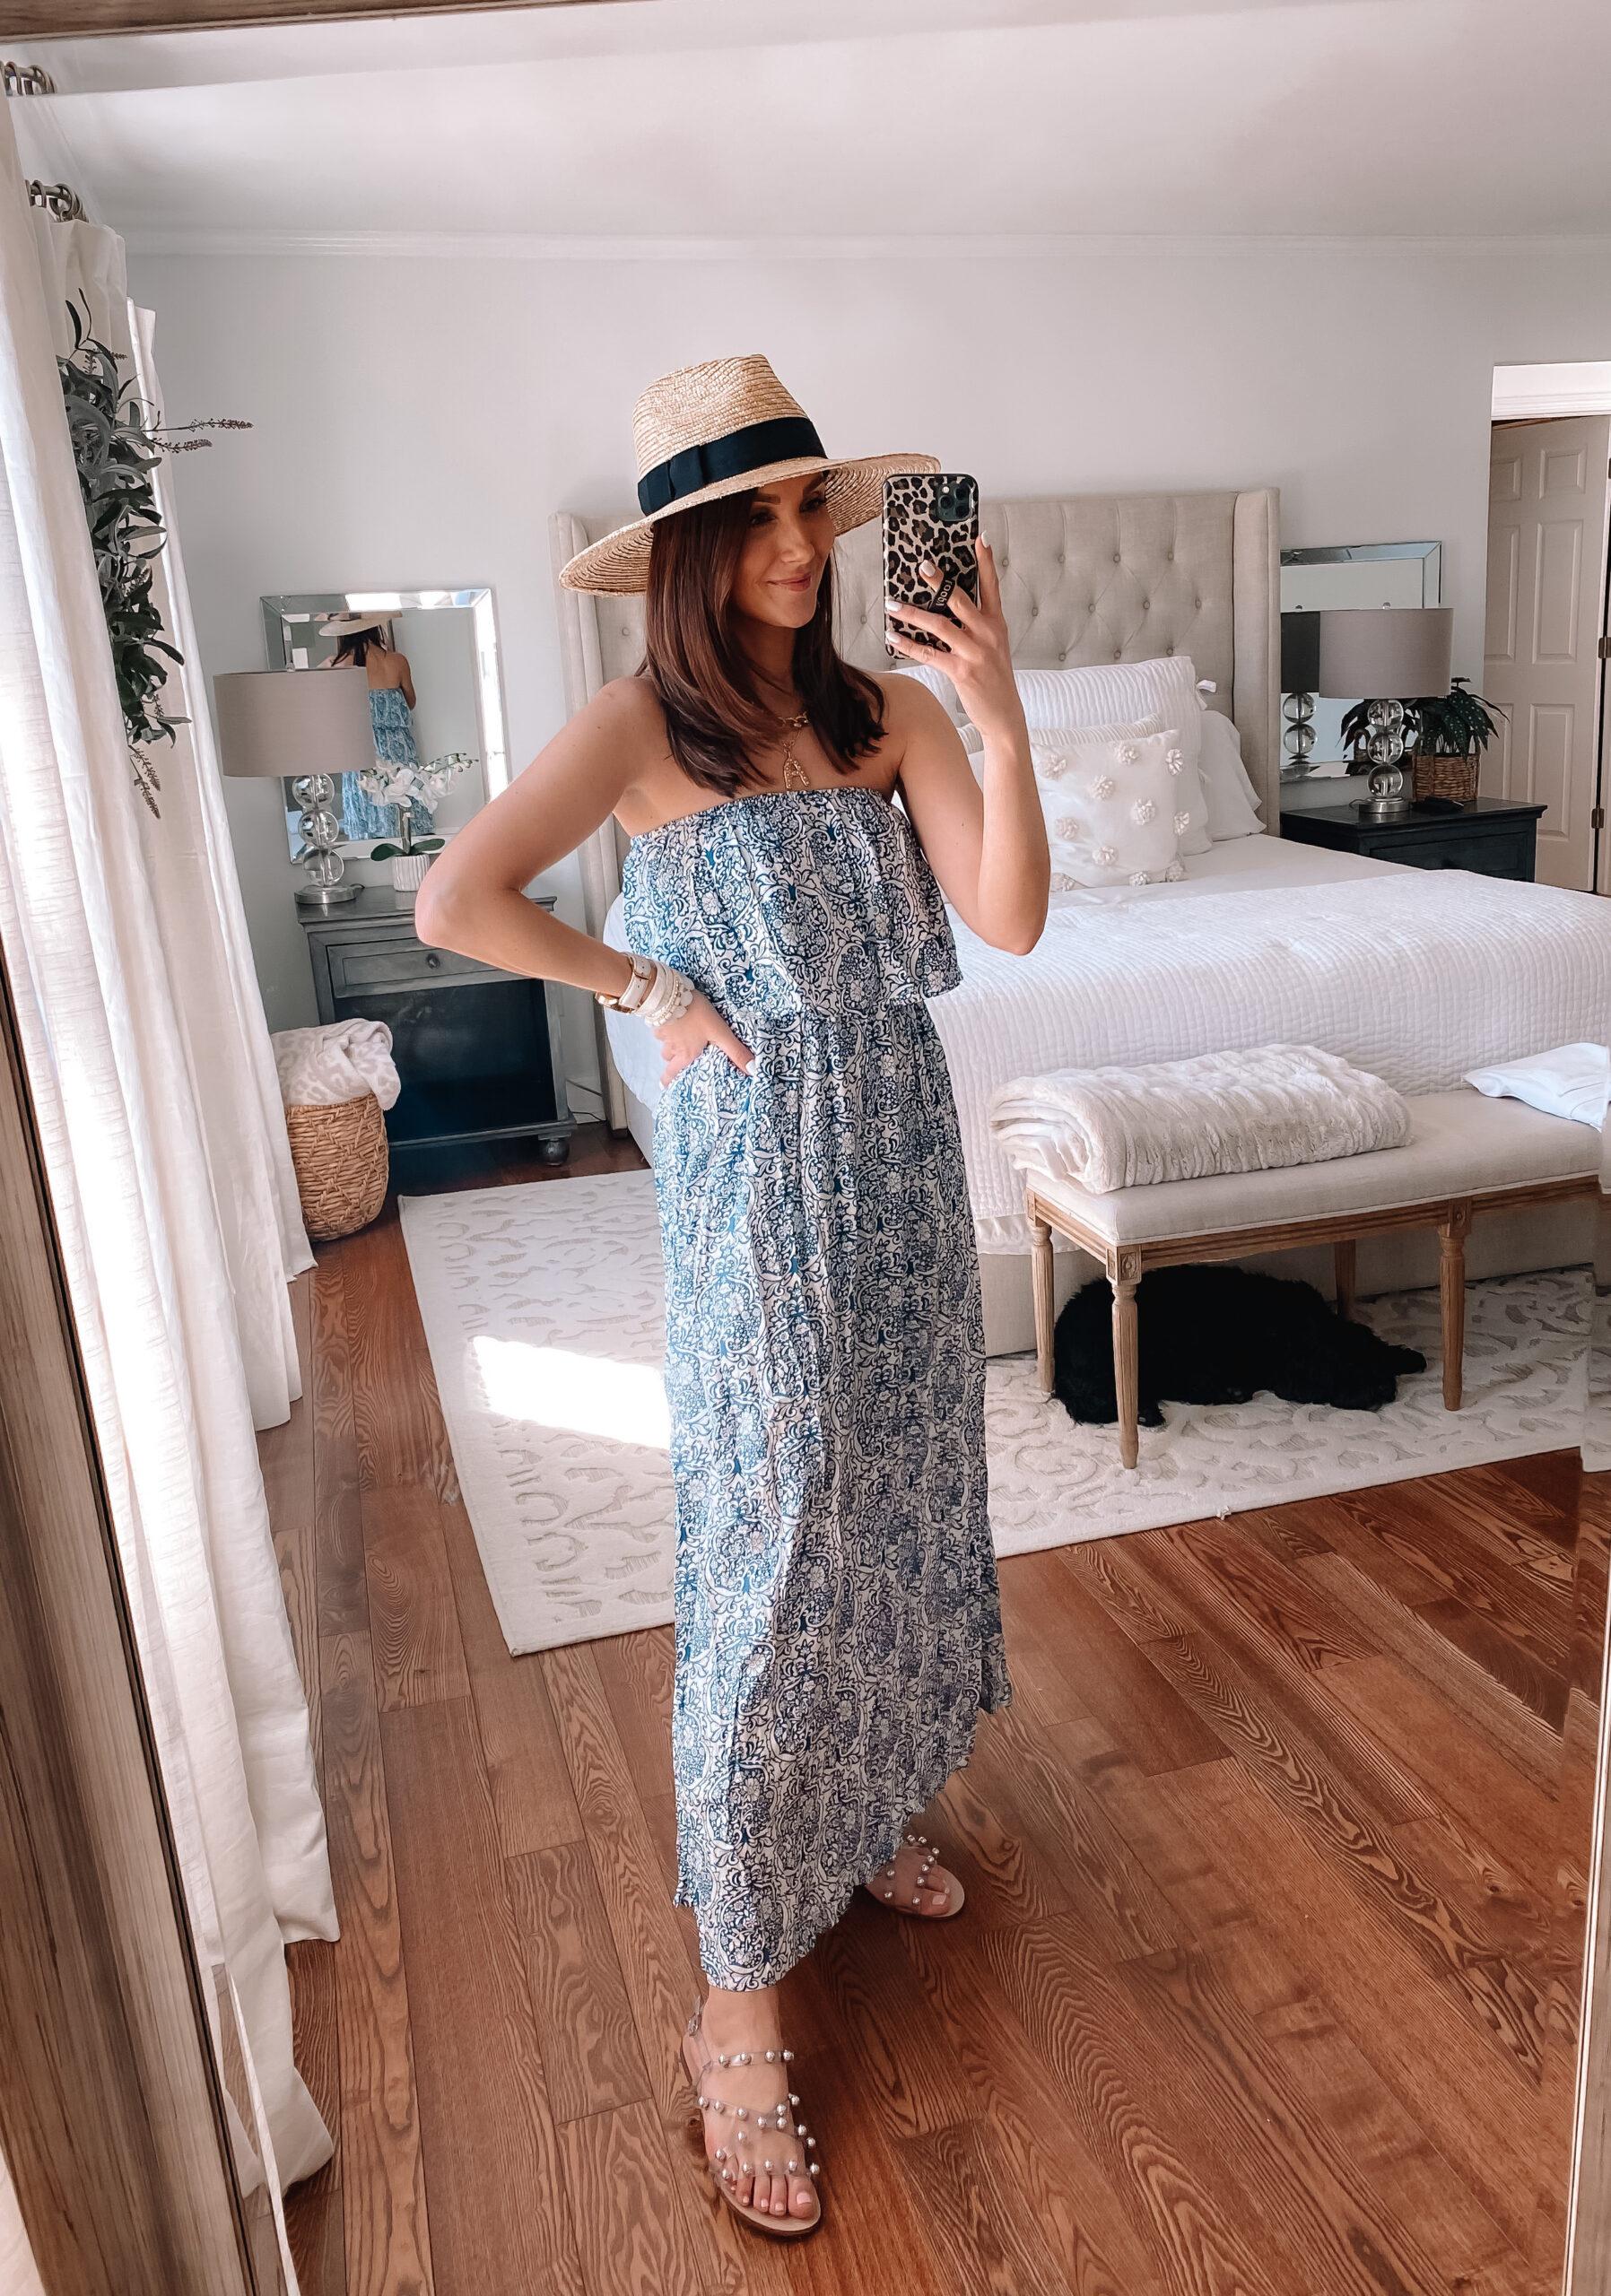 amazon blue maxi dress, amazon style